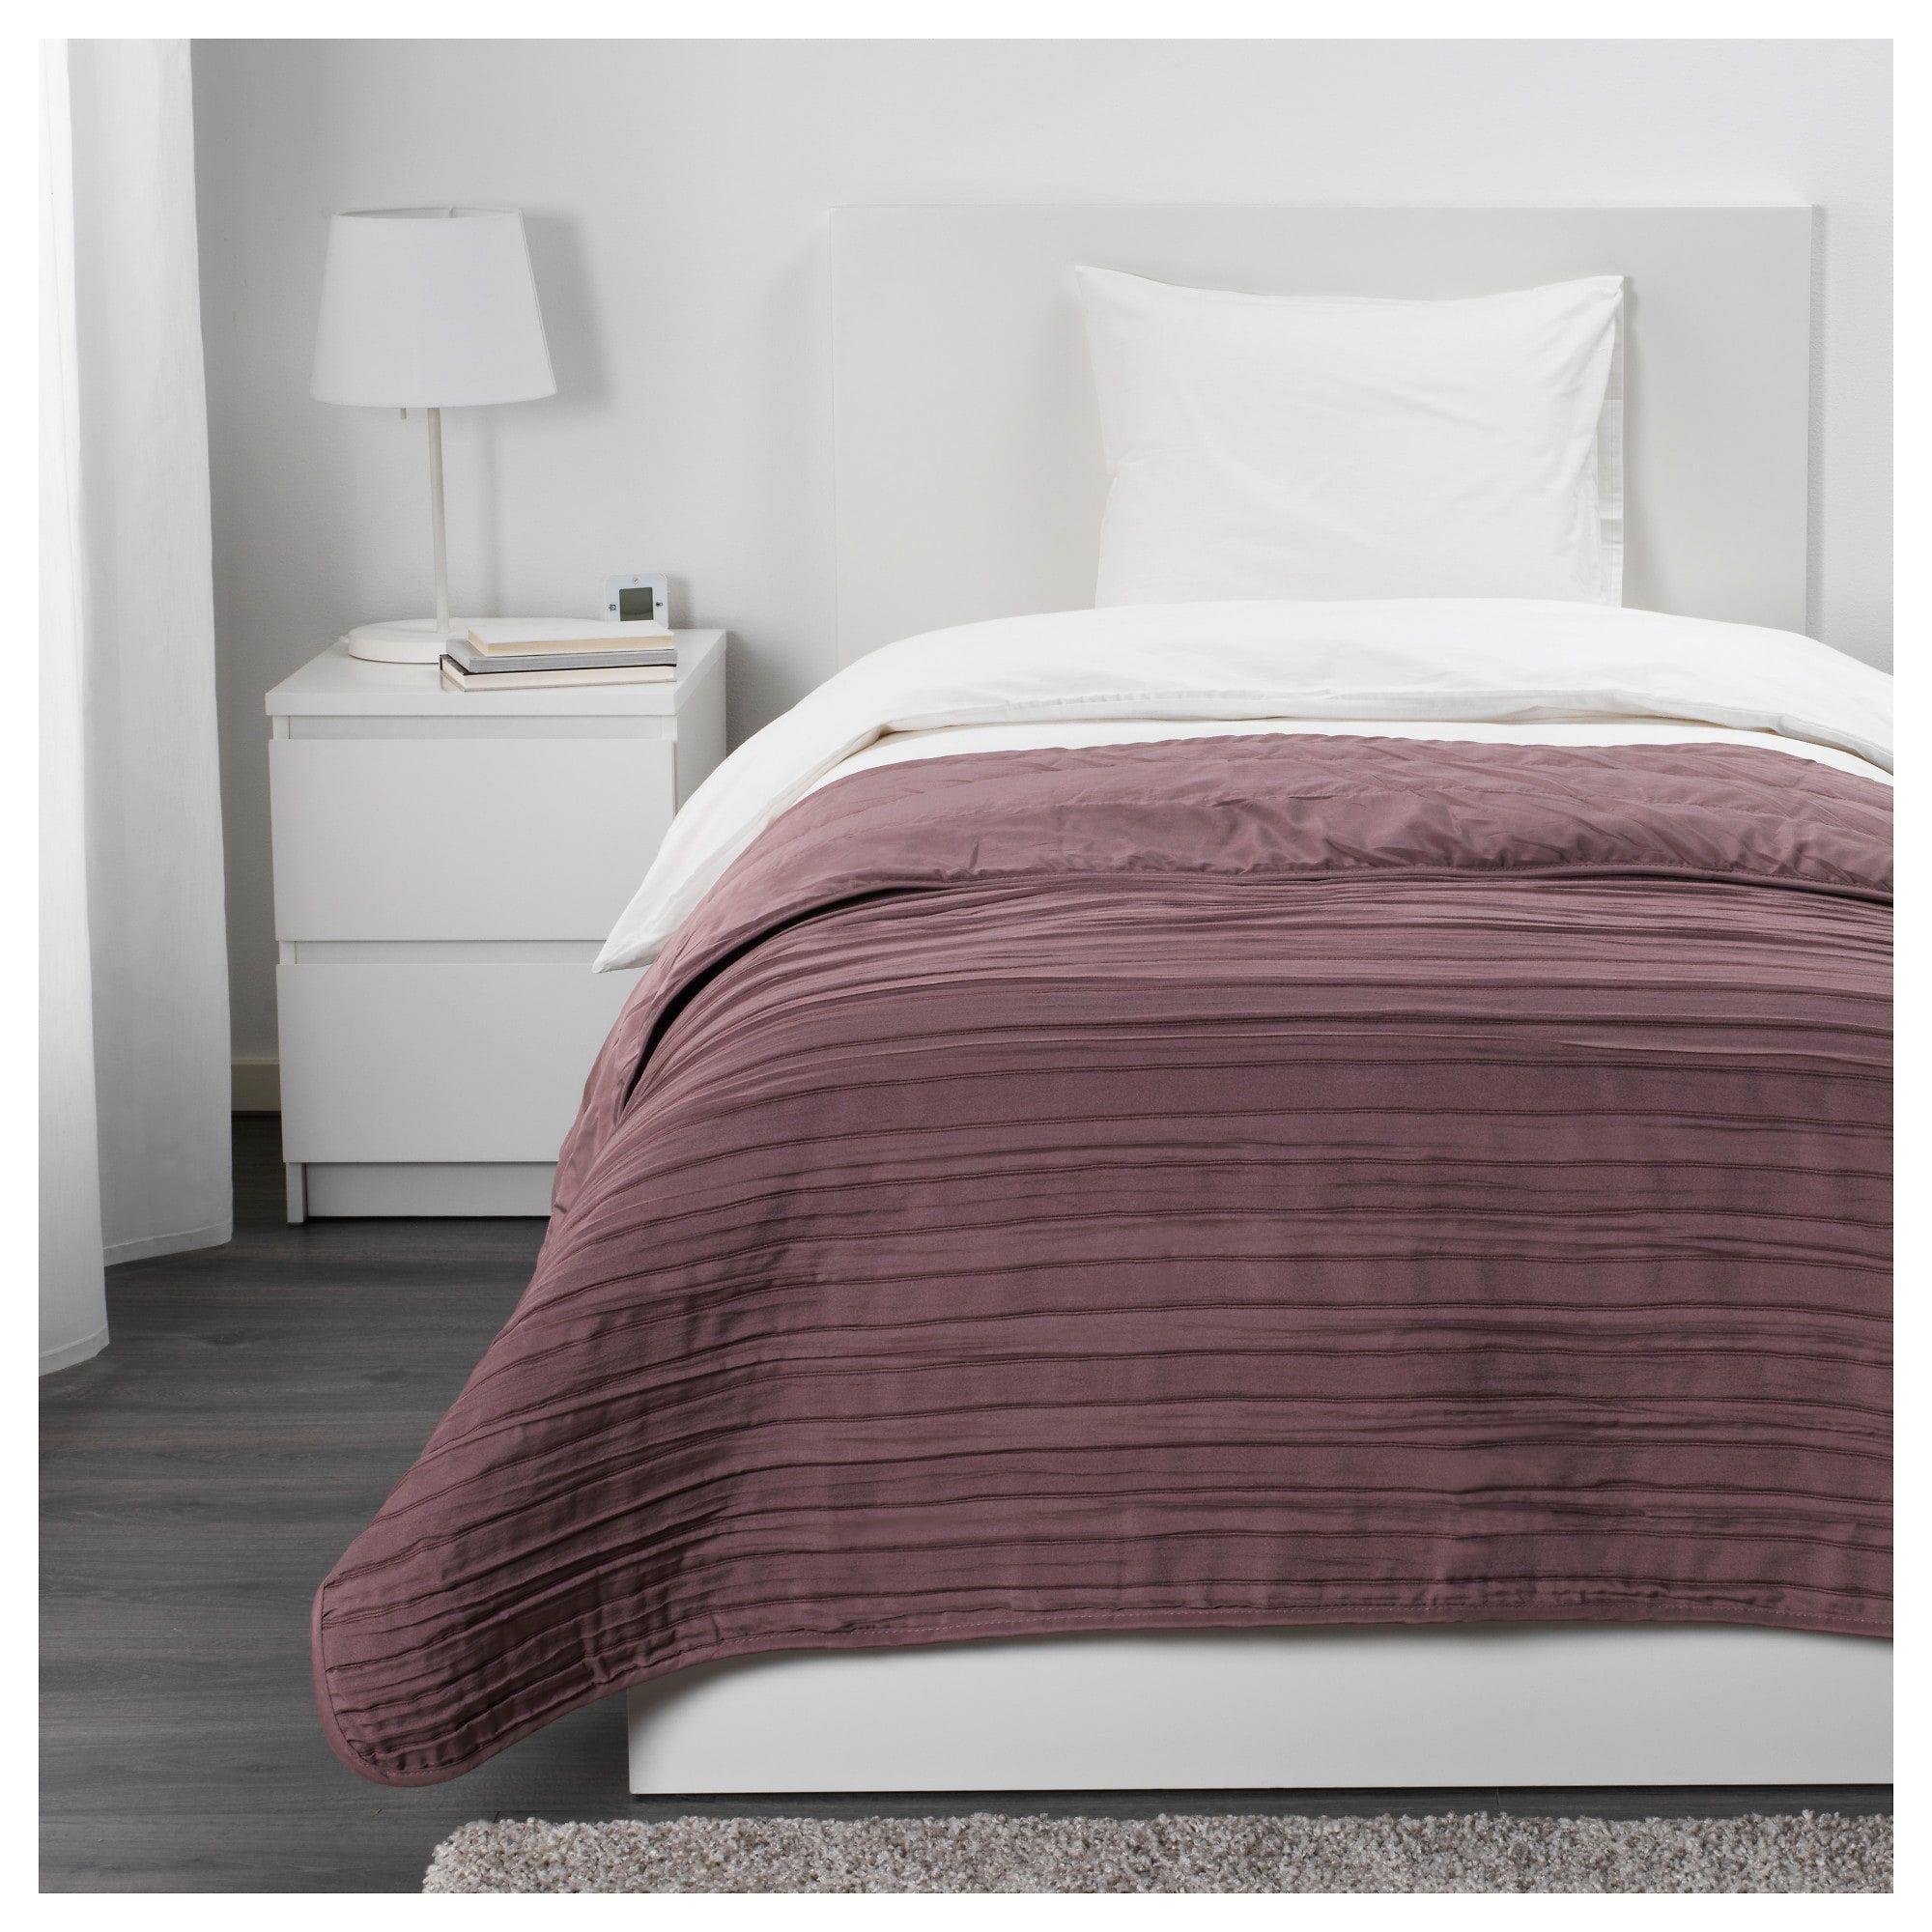 Veketag Bedspread Lilac Ikea Tagesdecke Lila Tagesdecke Bettgrossen